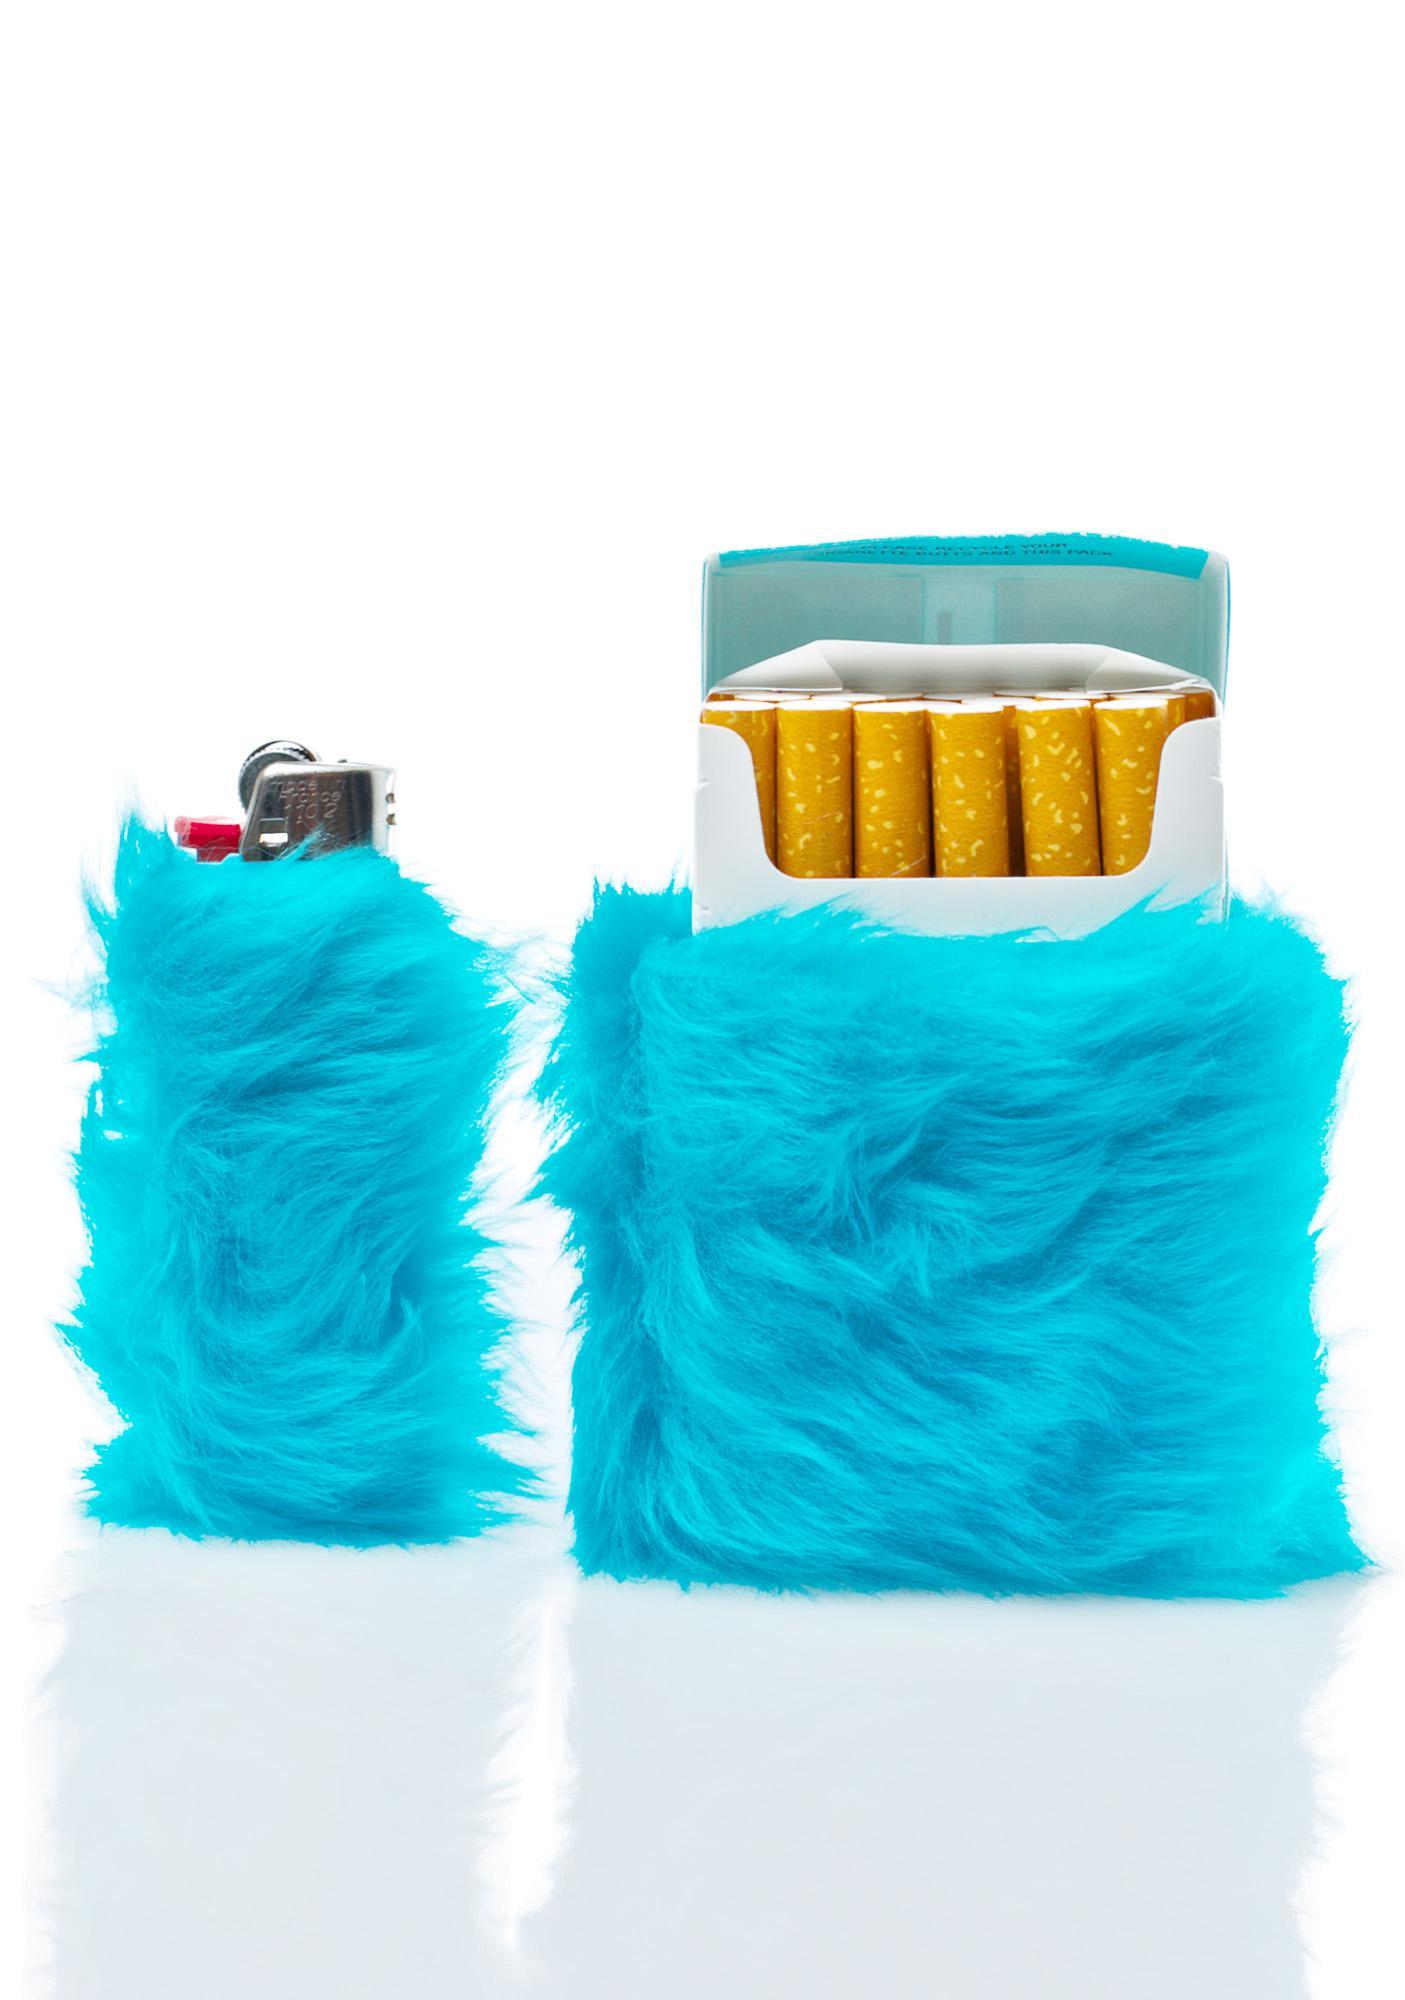 Kerenika Kandi Krush Teal Lighter & Cigarette Fur Case Set